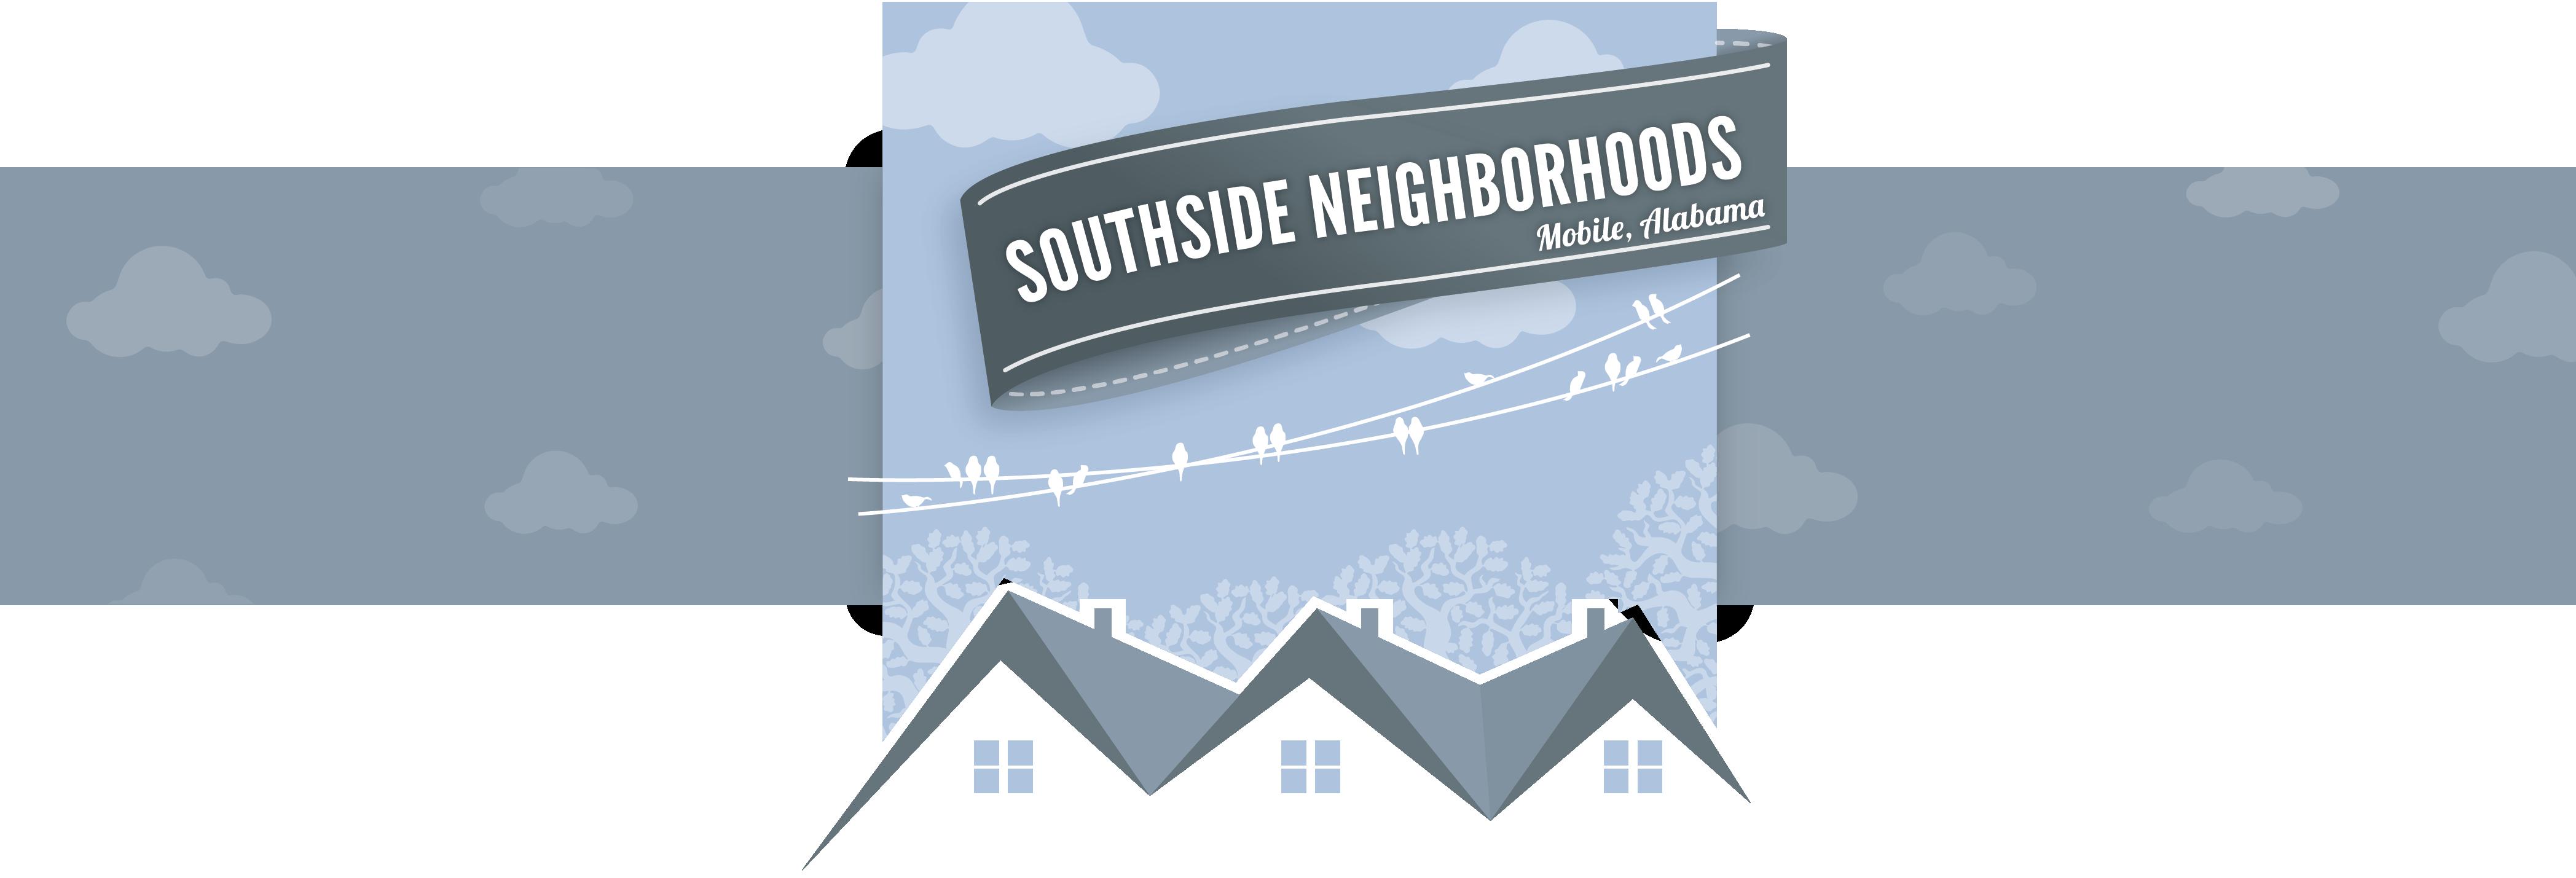 Southside Choice Neighborhoods Plan